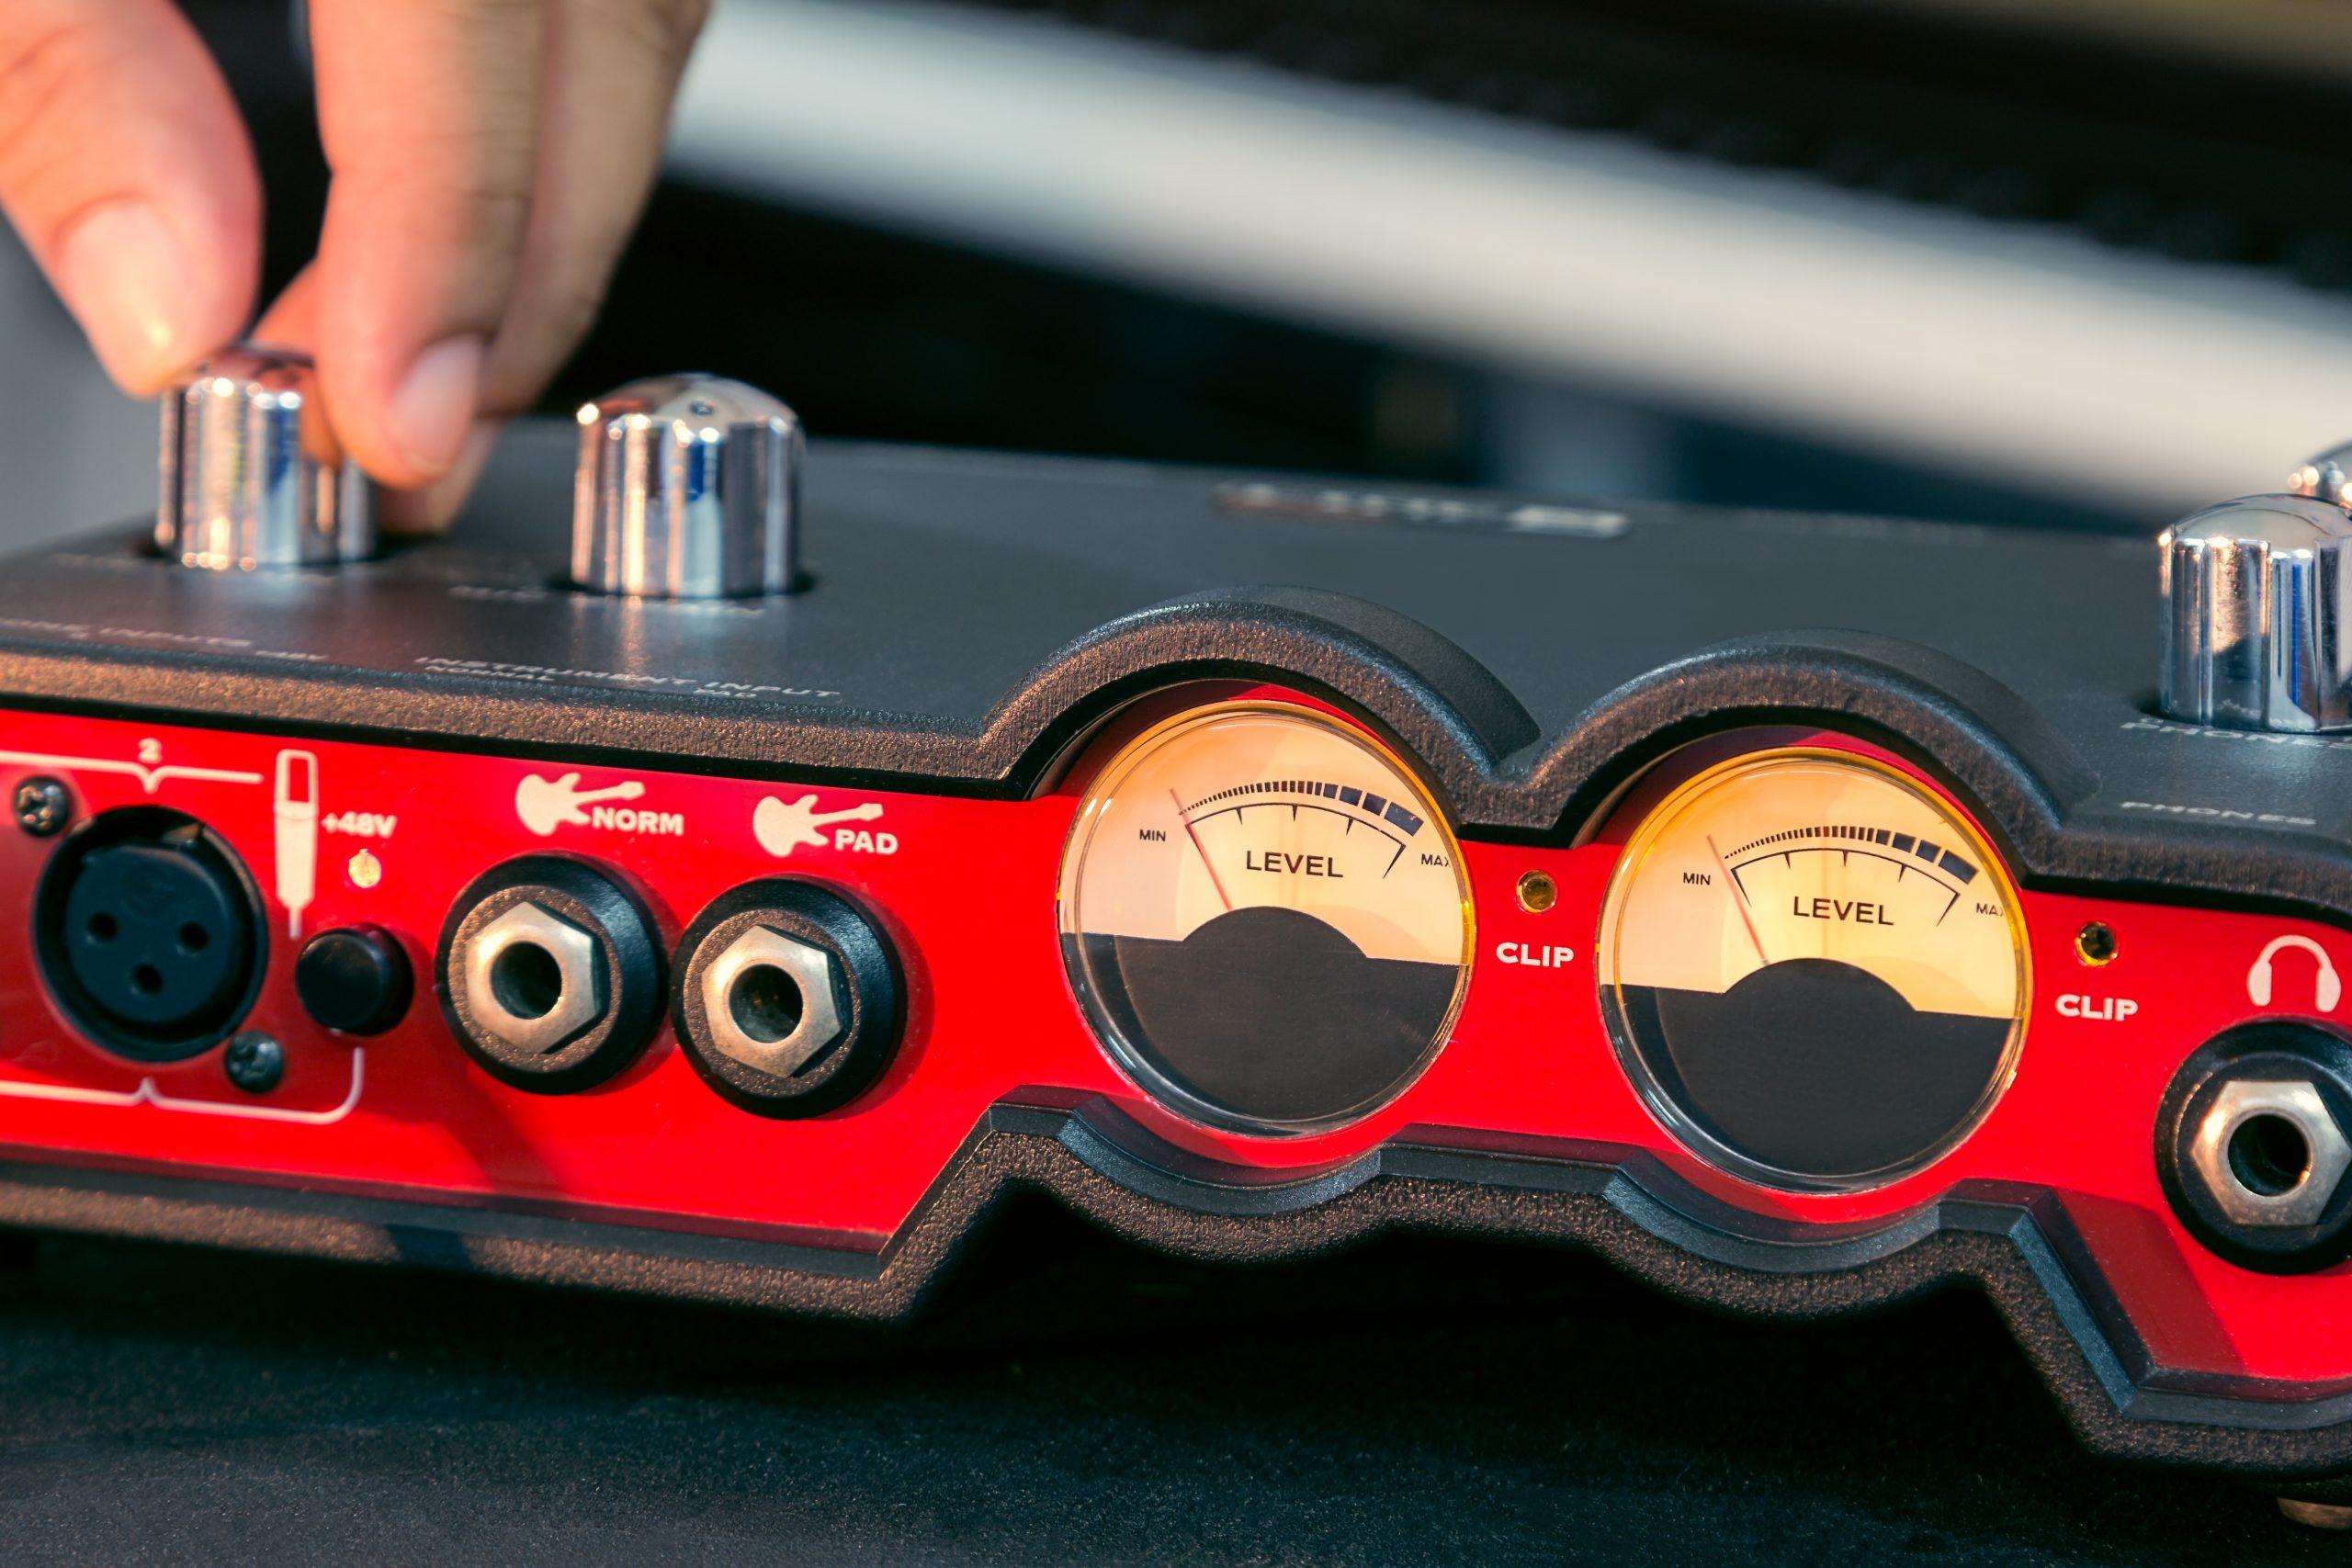 Hand adjust volume of the audio.